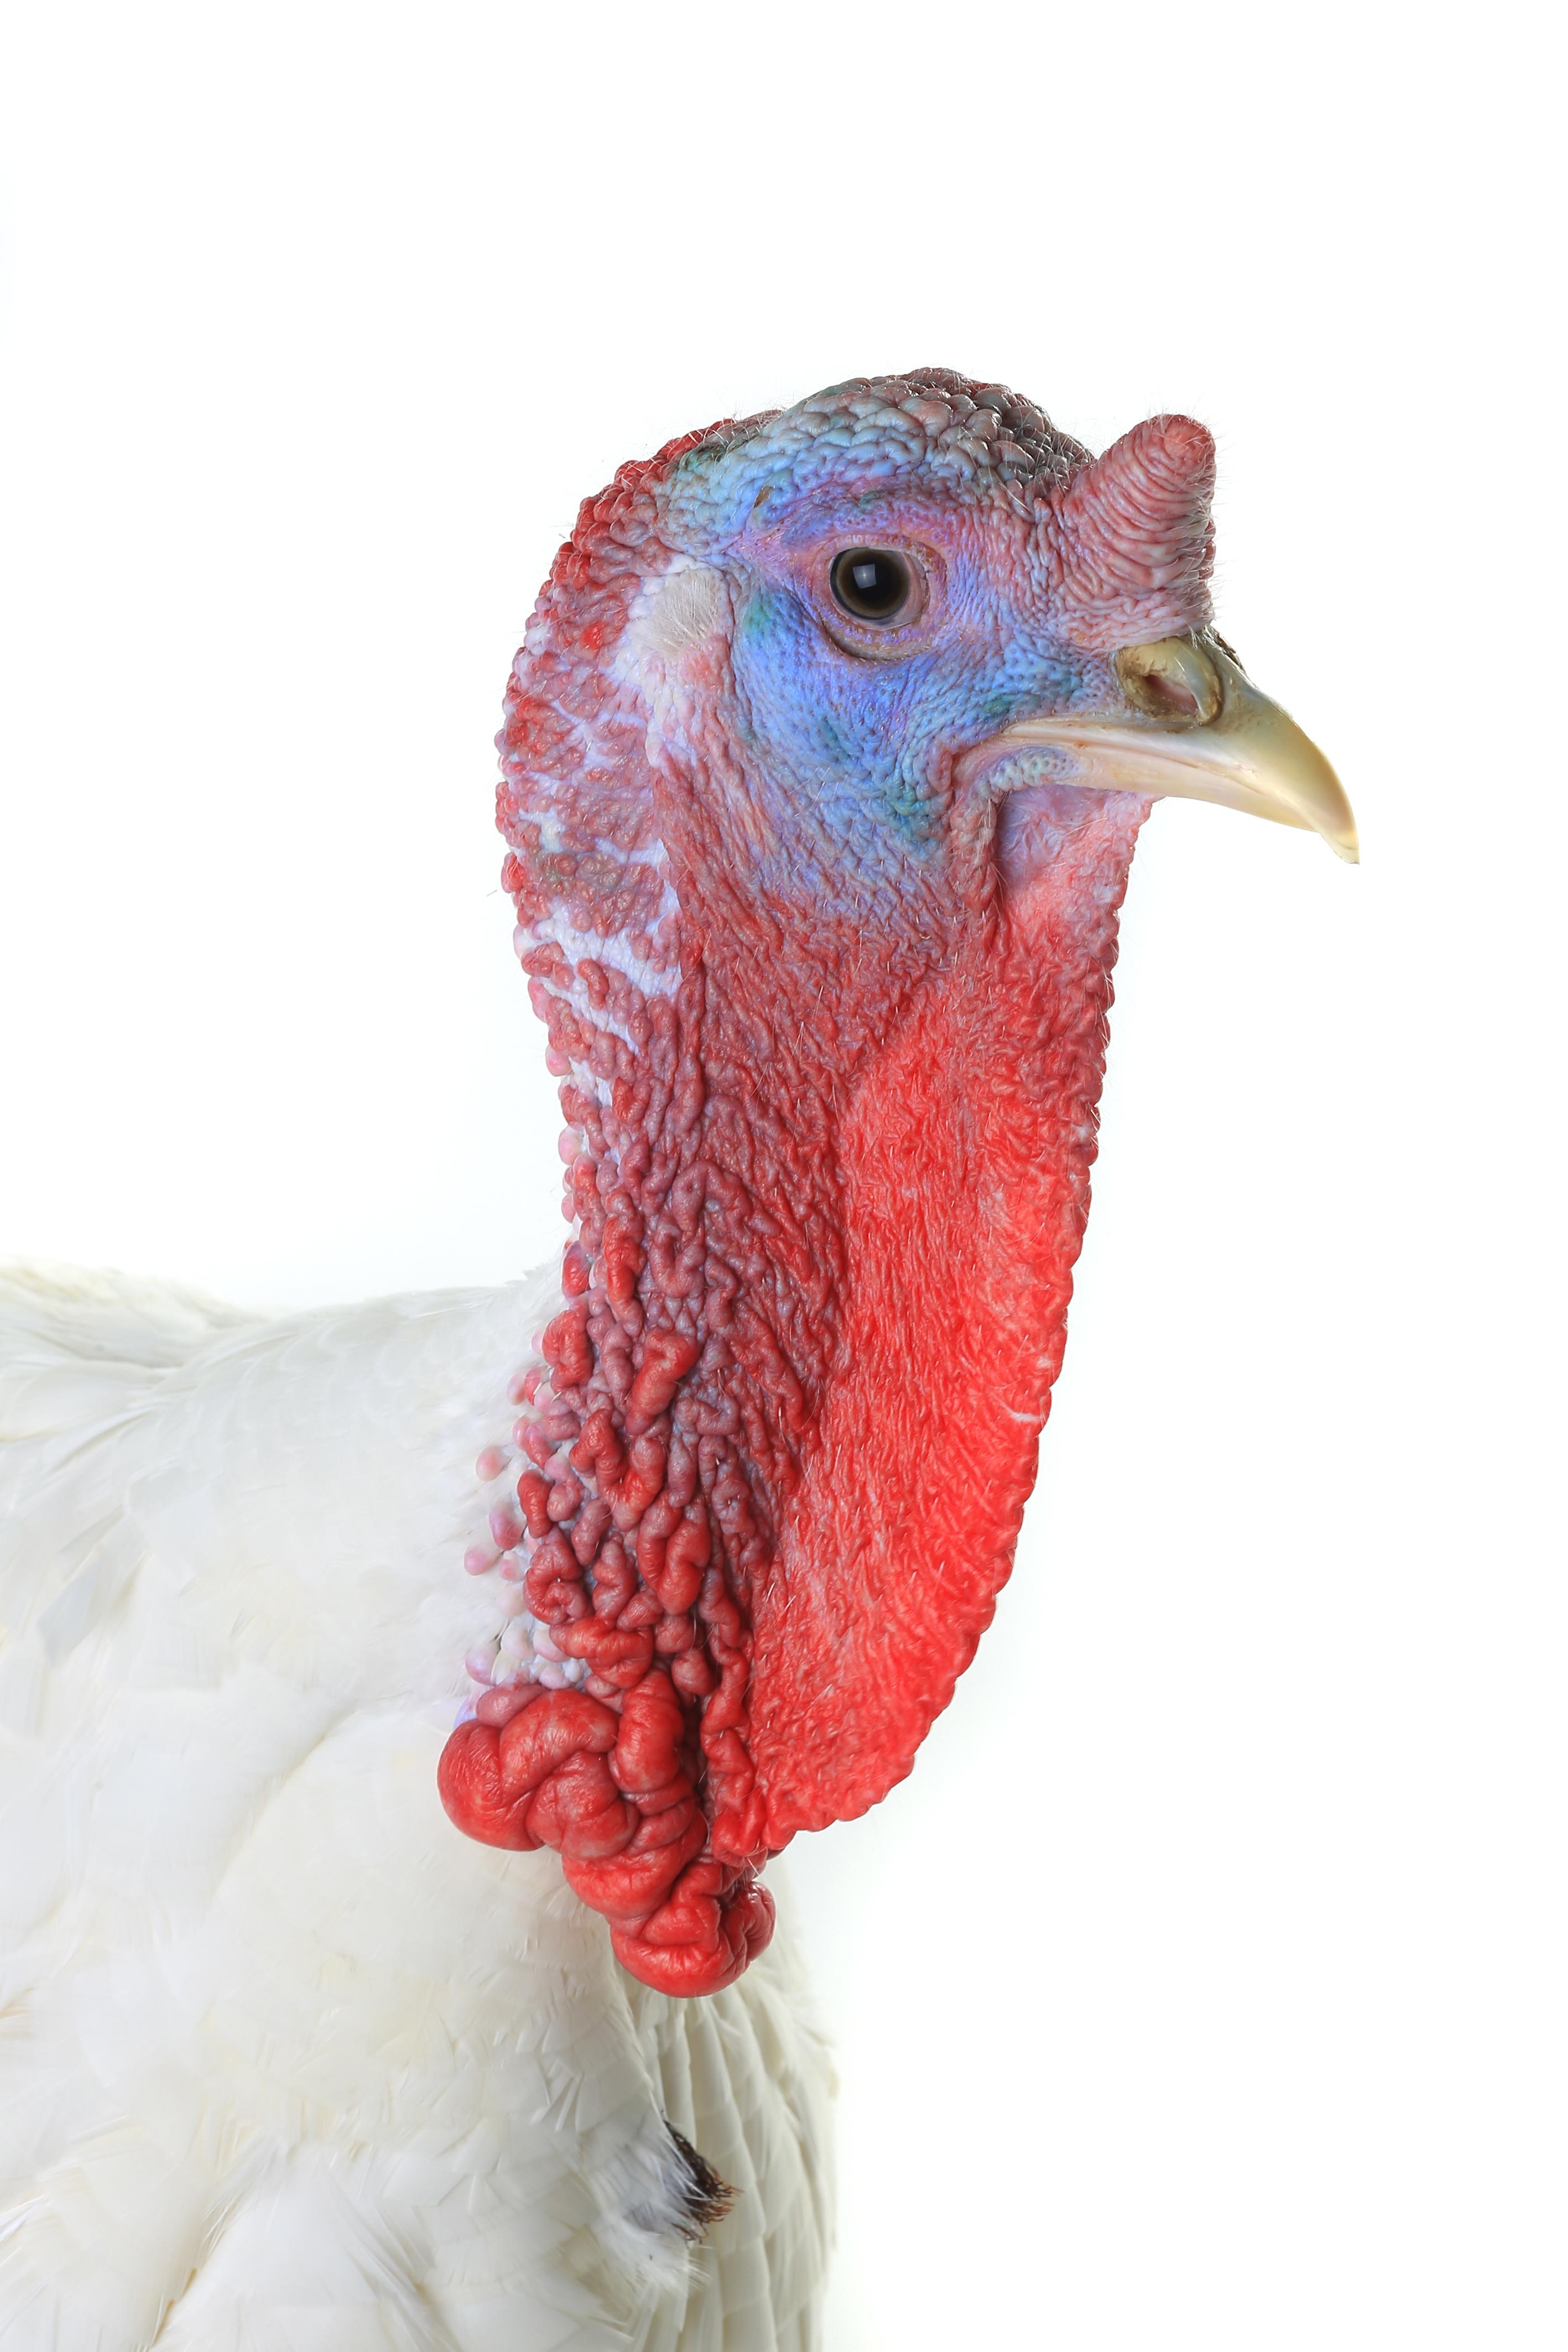 how to cook turkey nexk